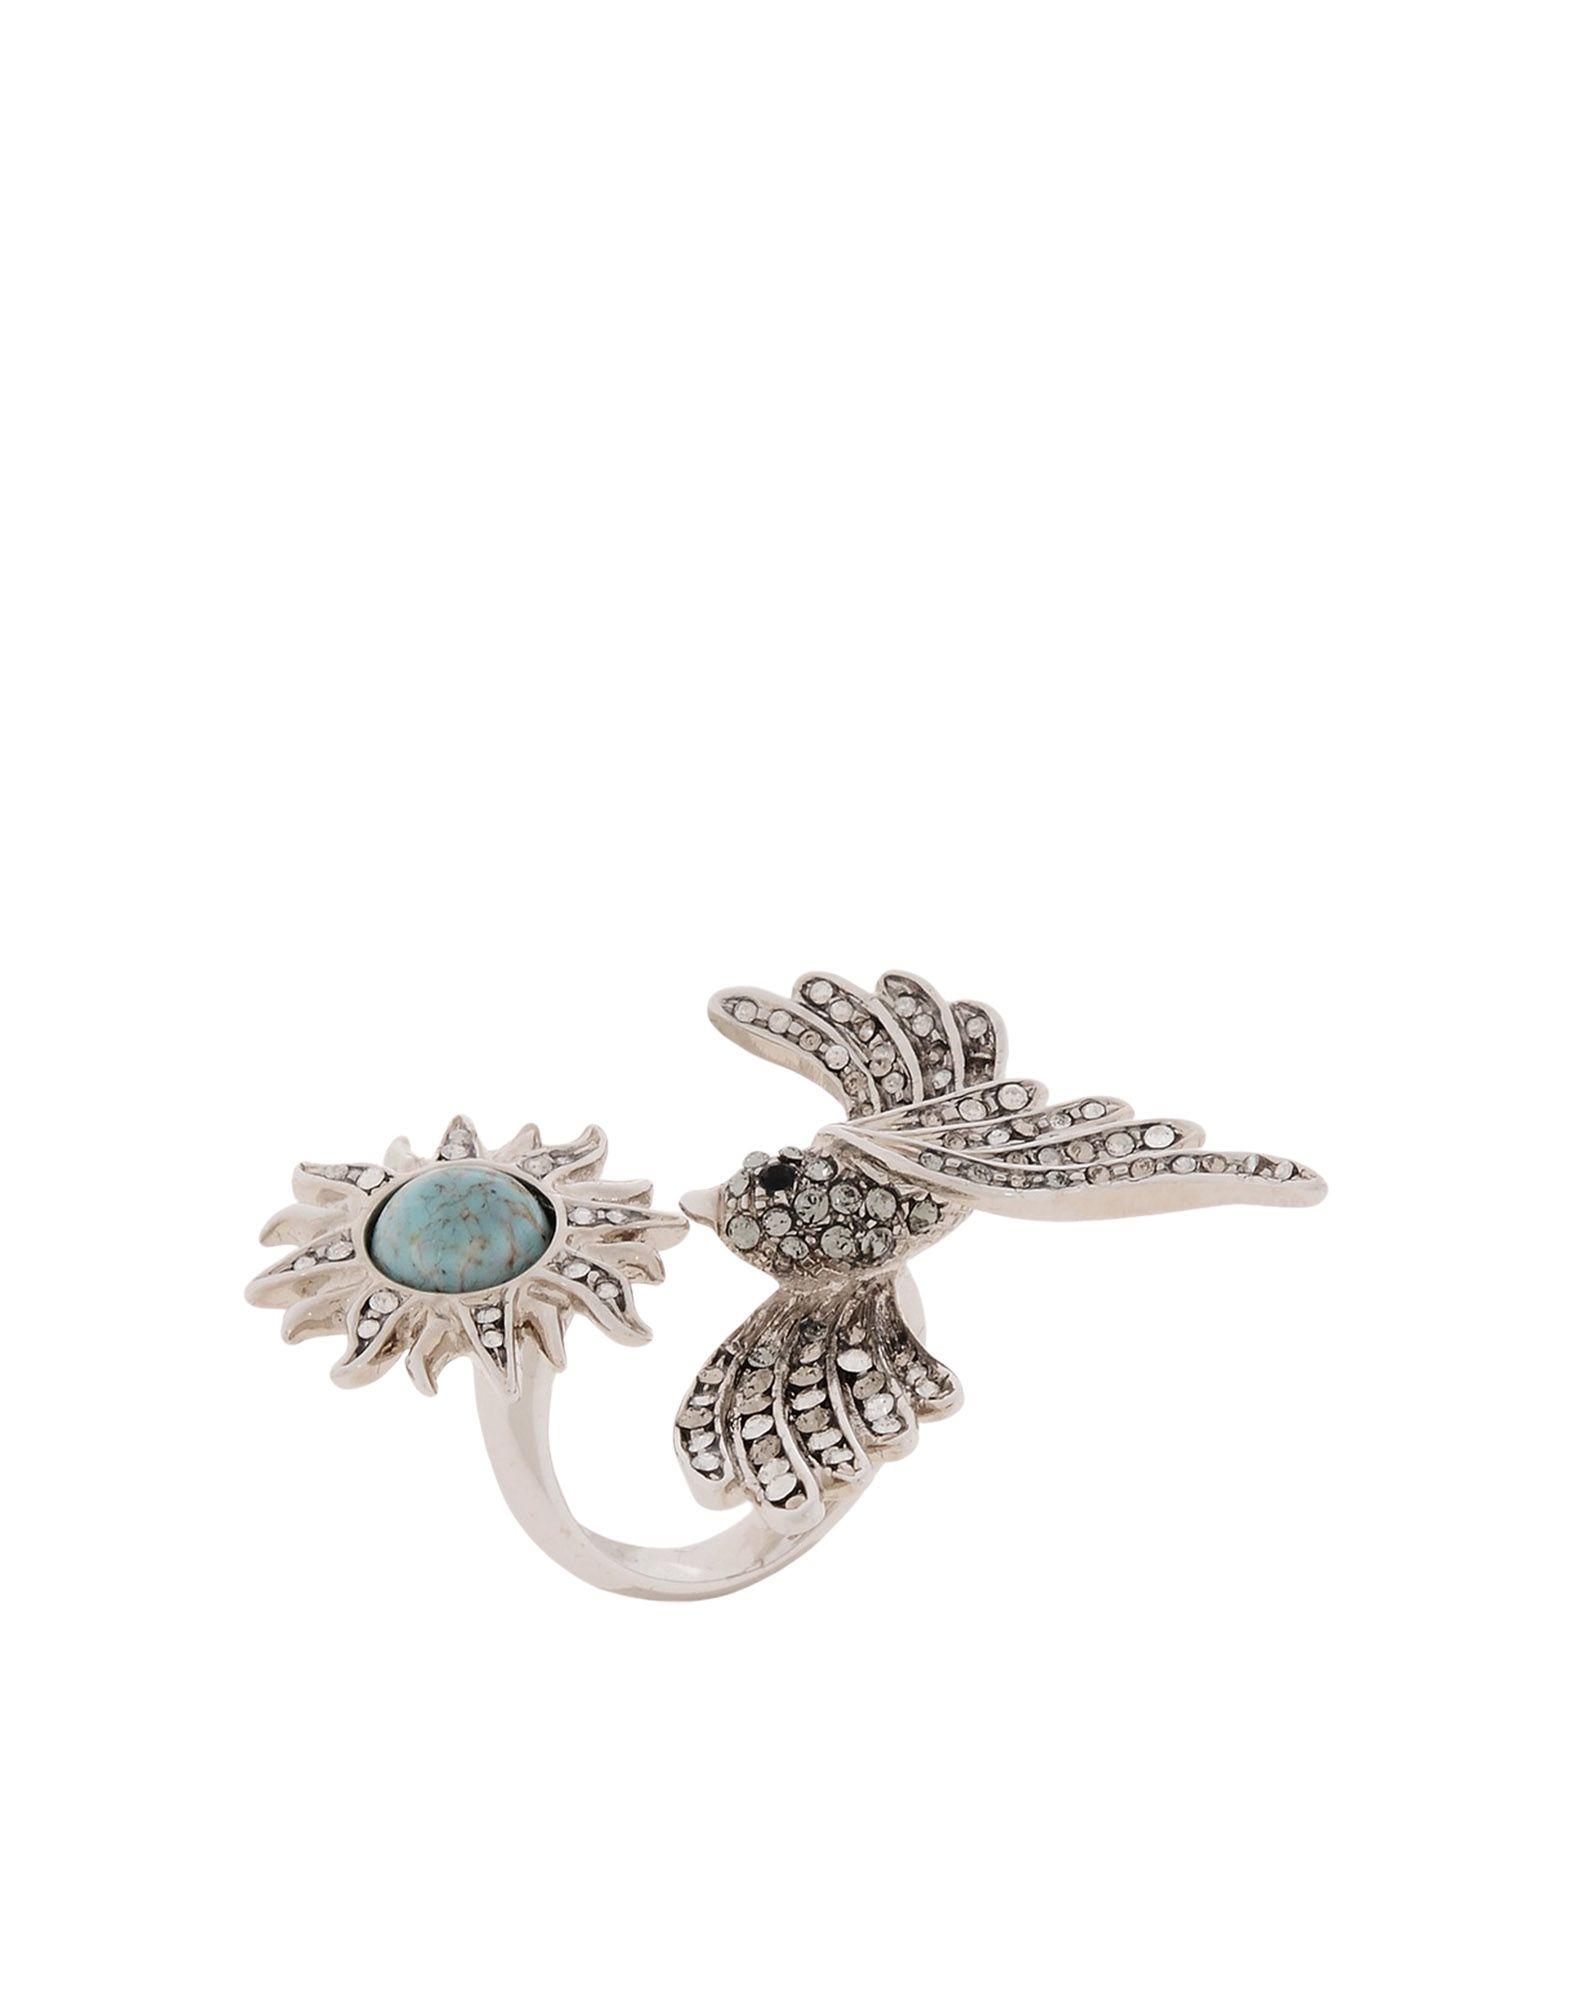 Aamaya By Priyanka JEWELRY - Earrings su YOOX.COM Ms4V52wbt